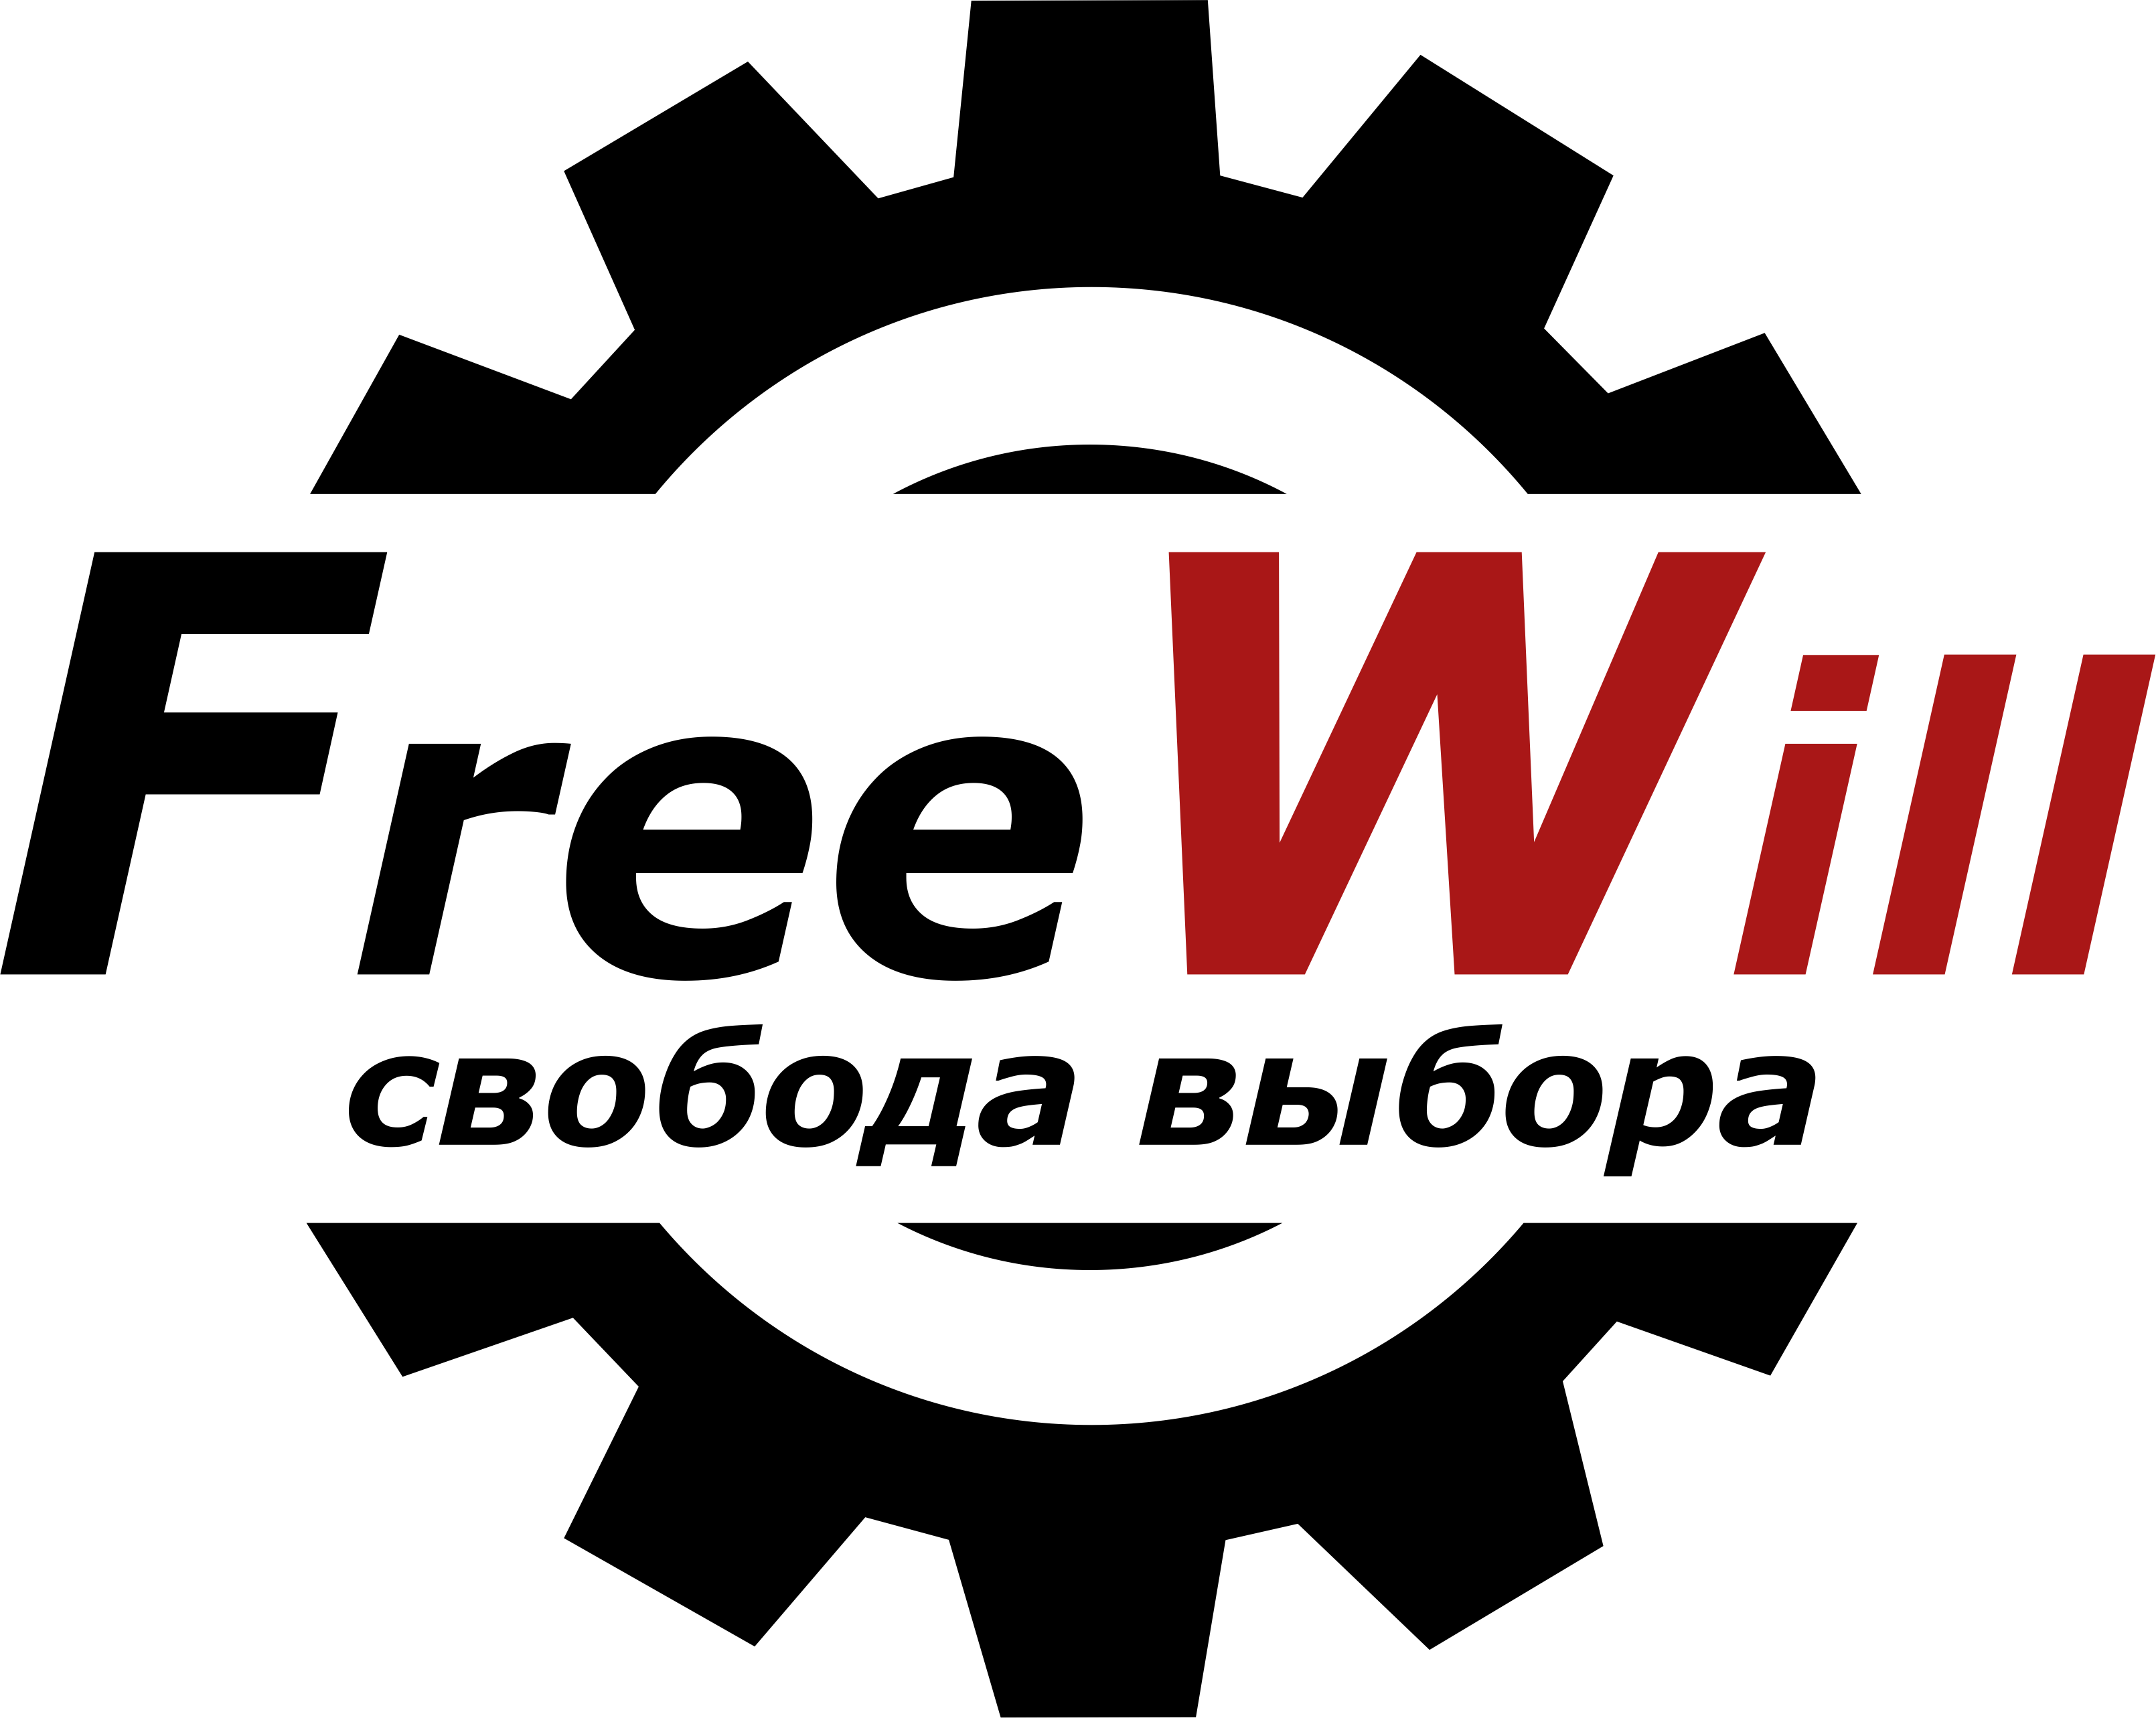 Wree Will Втулки и Сайлетблоки из полиуретана